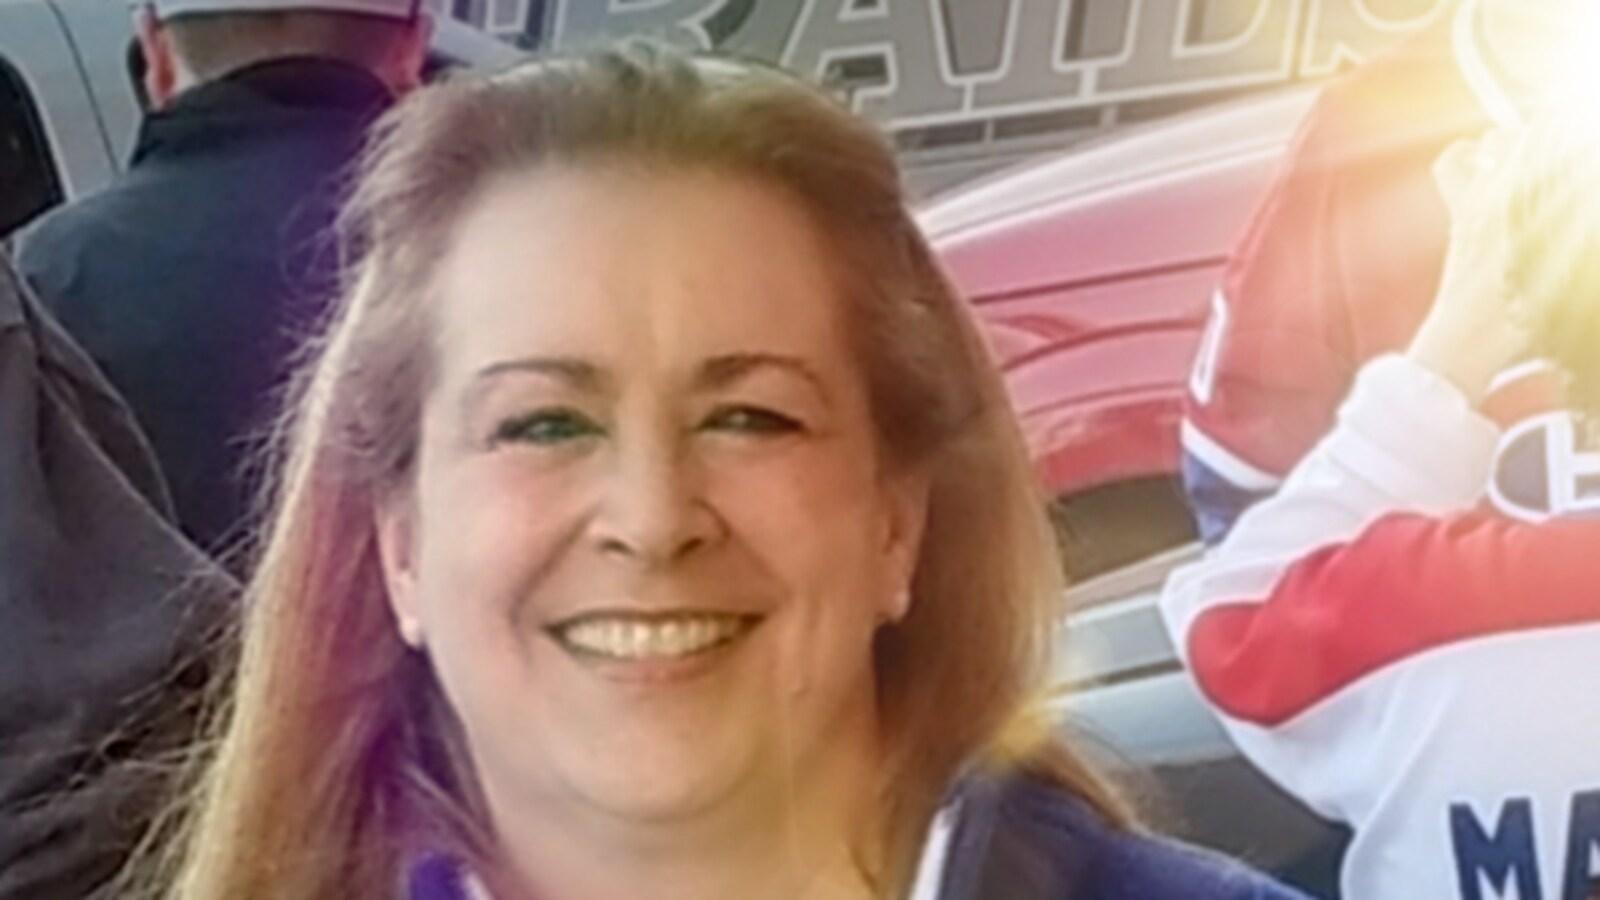 Marie-Guylaine Briand porte un chandail des Canadiens